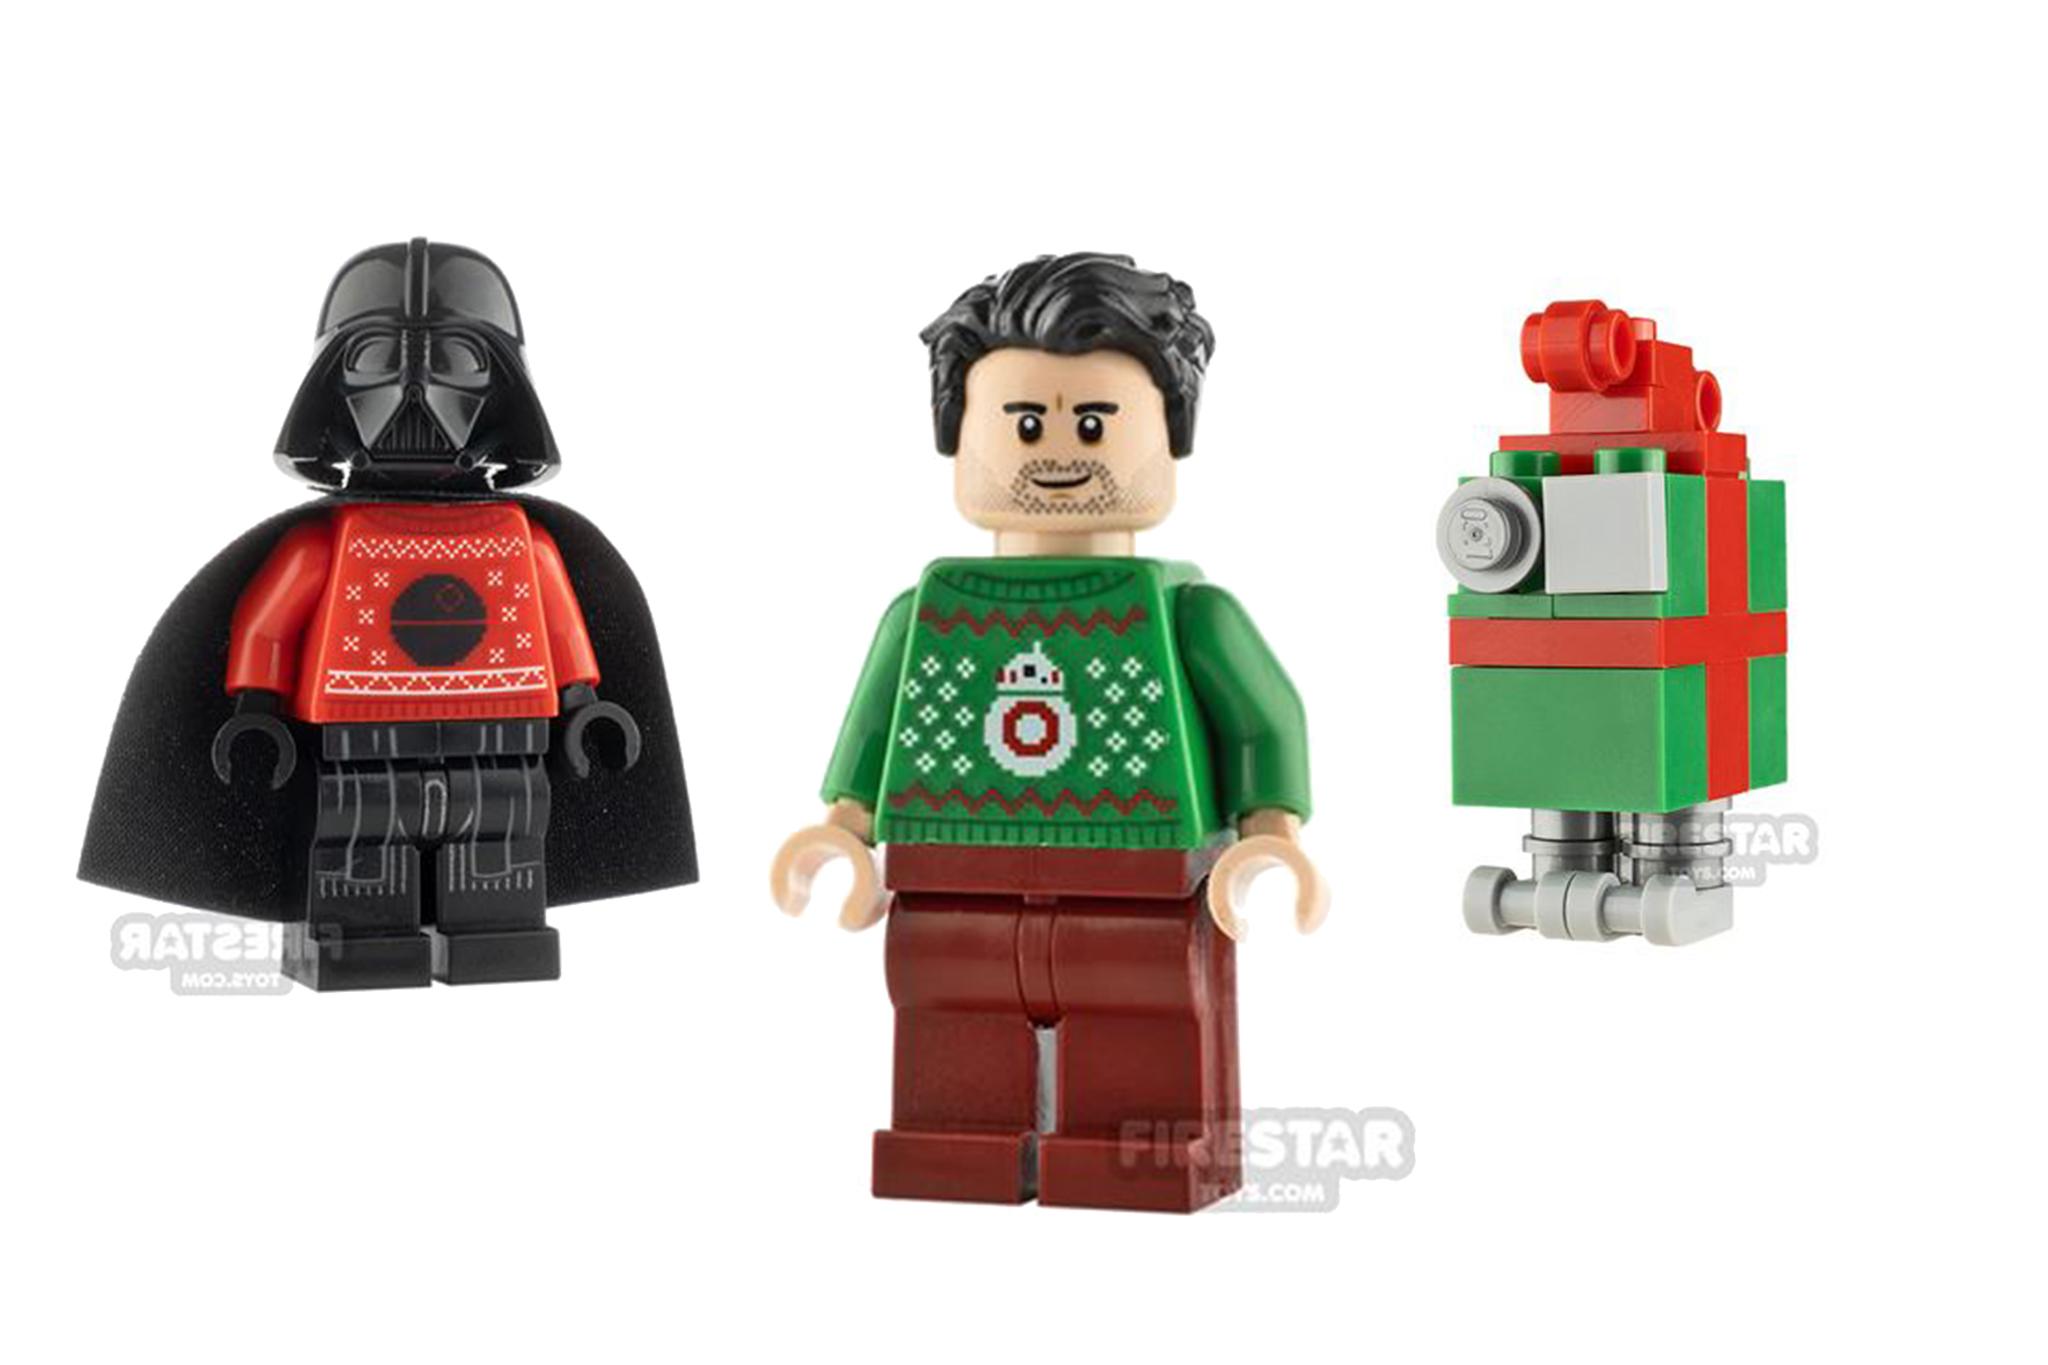 LEGO Christmas Minifigures - Christmas Sweater Vader, Poe Dameron and festive Gonk Droid